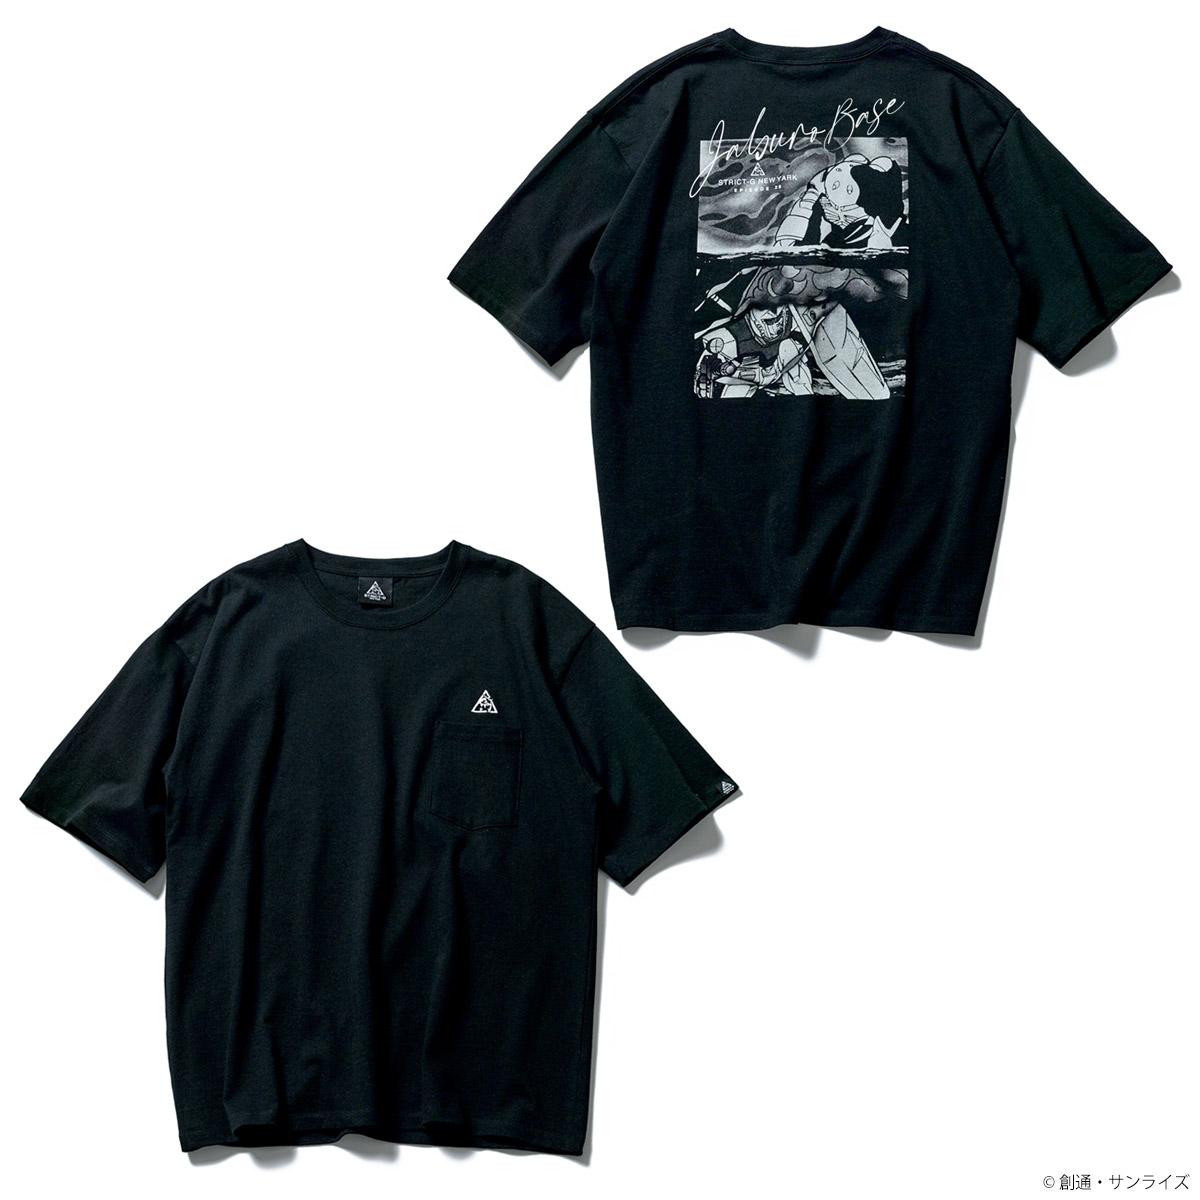 STRICT-G NEW YARK ポケットビッグTシャツ JABURO